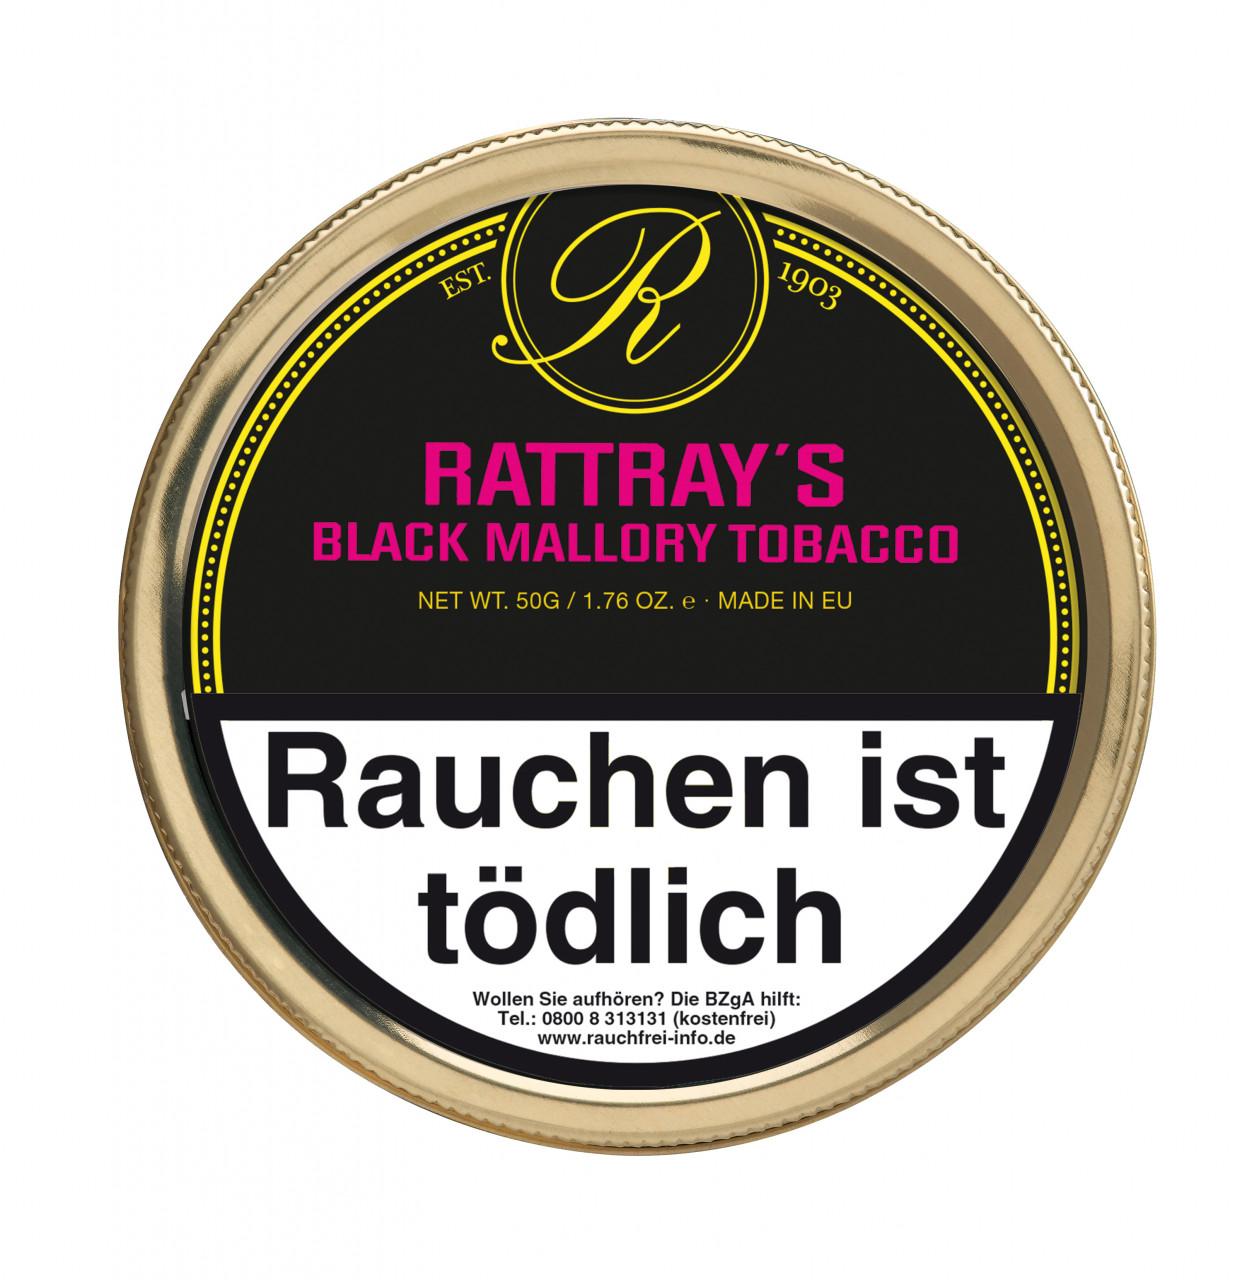 Rattray's Black Mallory